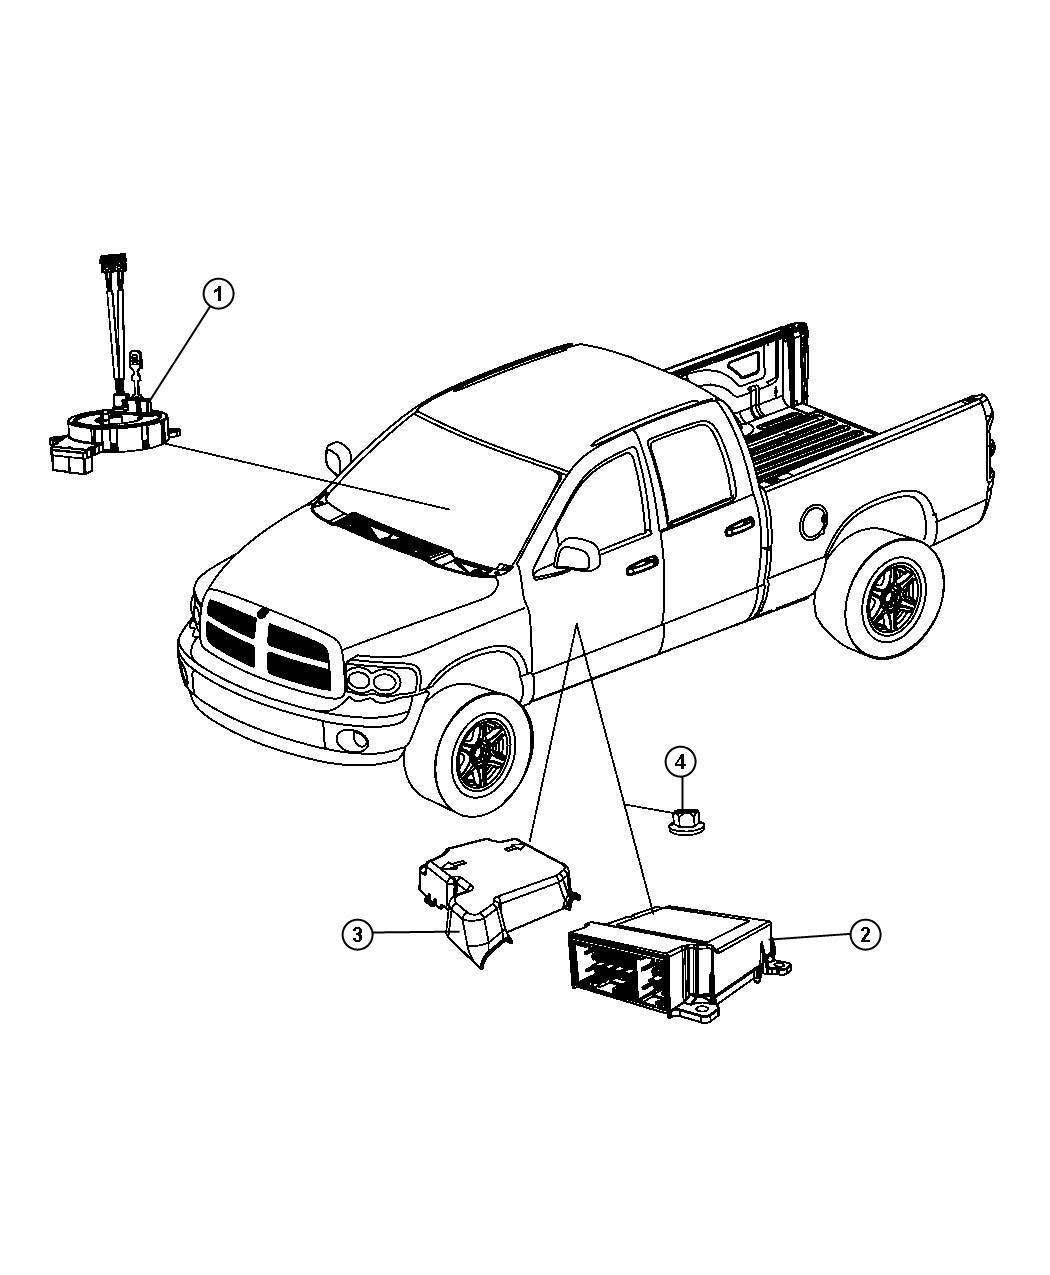 Dodge Ram 4500 Module. Occupant restraint. [driver air bag